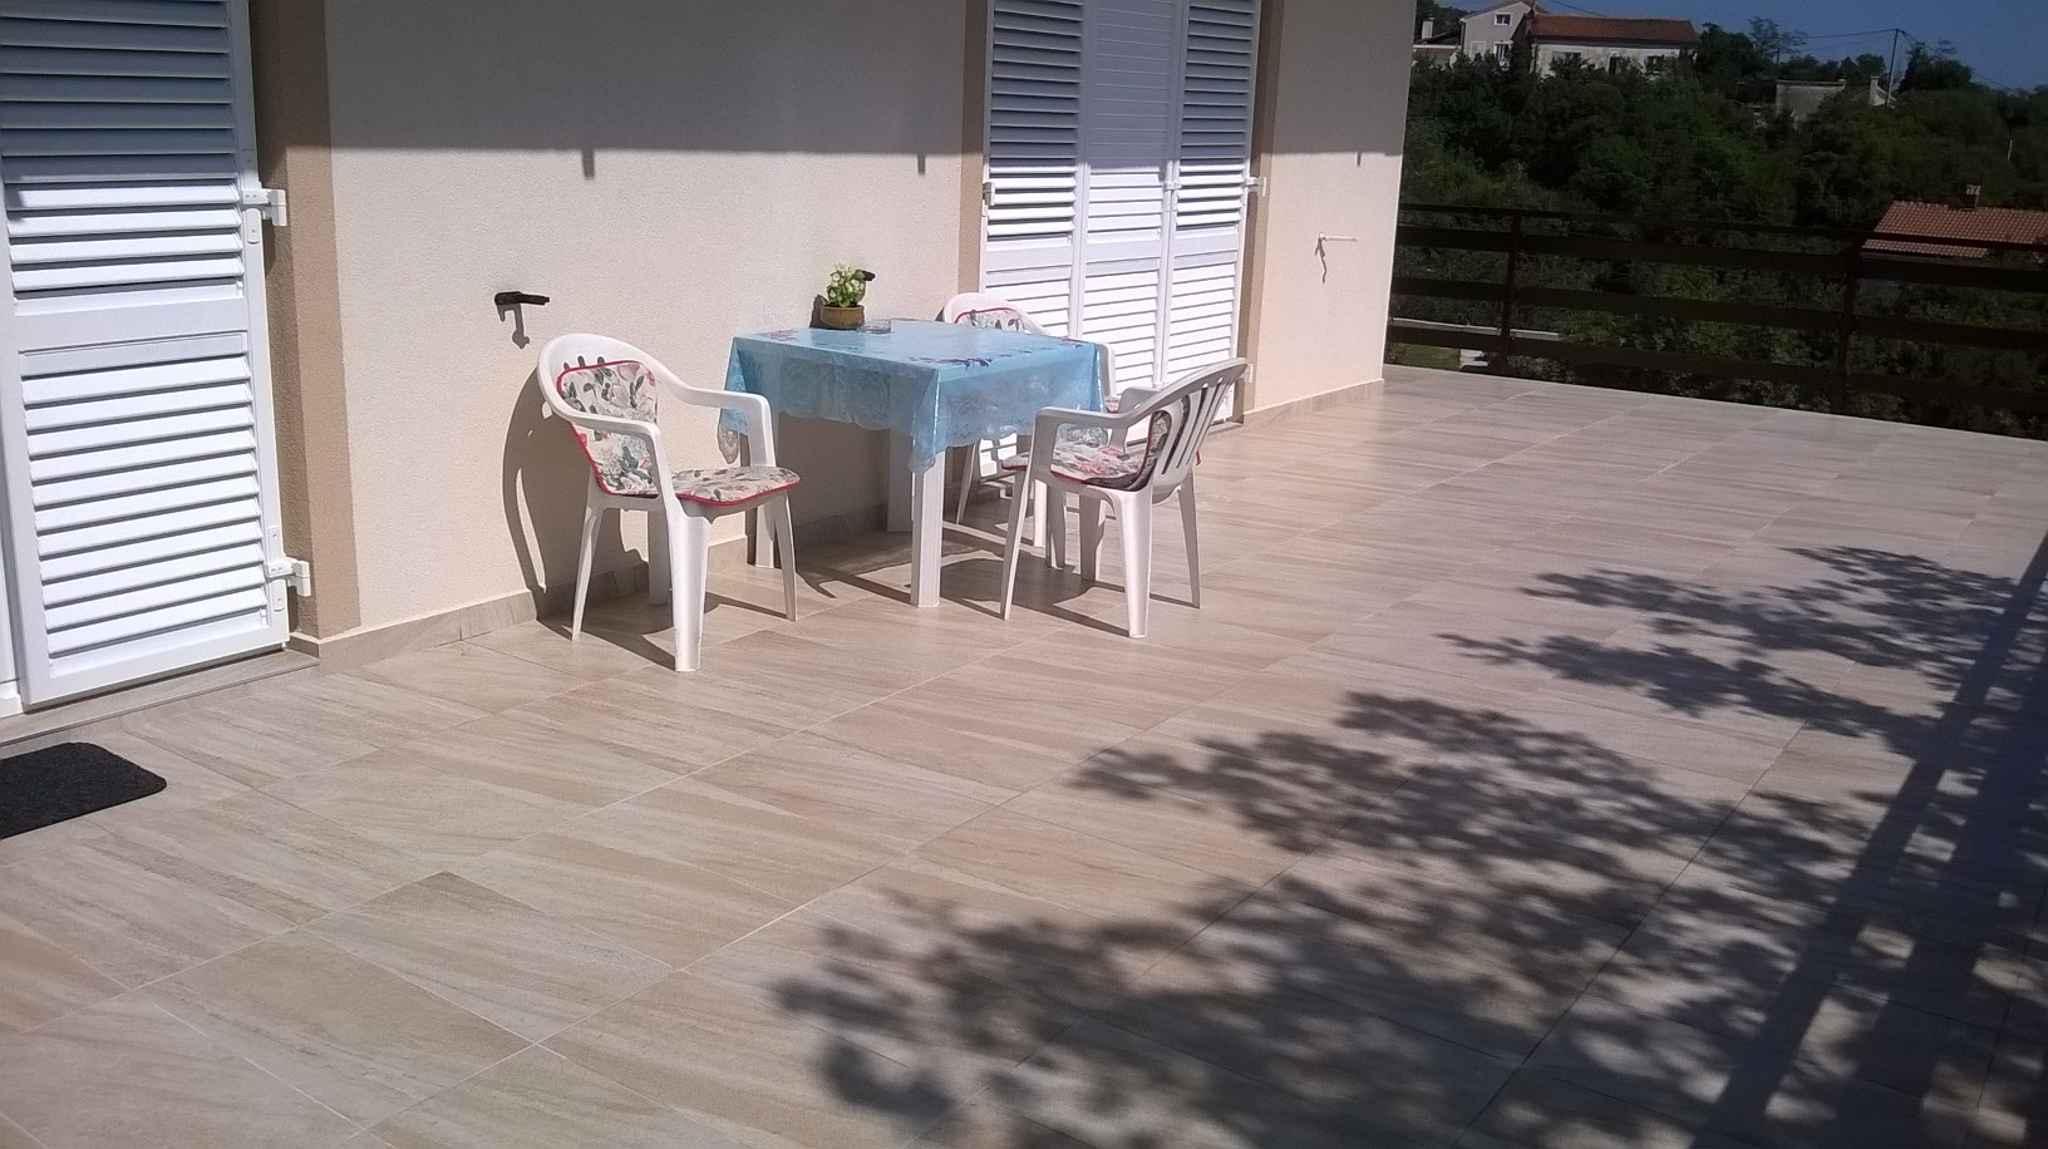 Appartement de vacances s ljetnom kuhinjom i bazenom (648047), Grižane, , Kvarner, Croatie, image 5